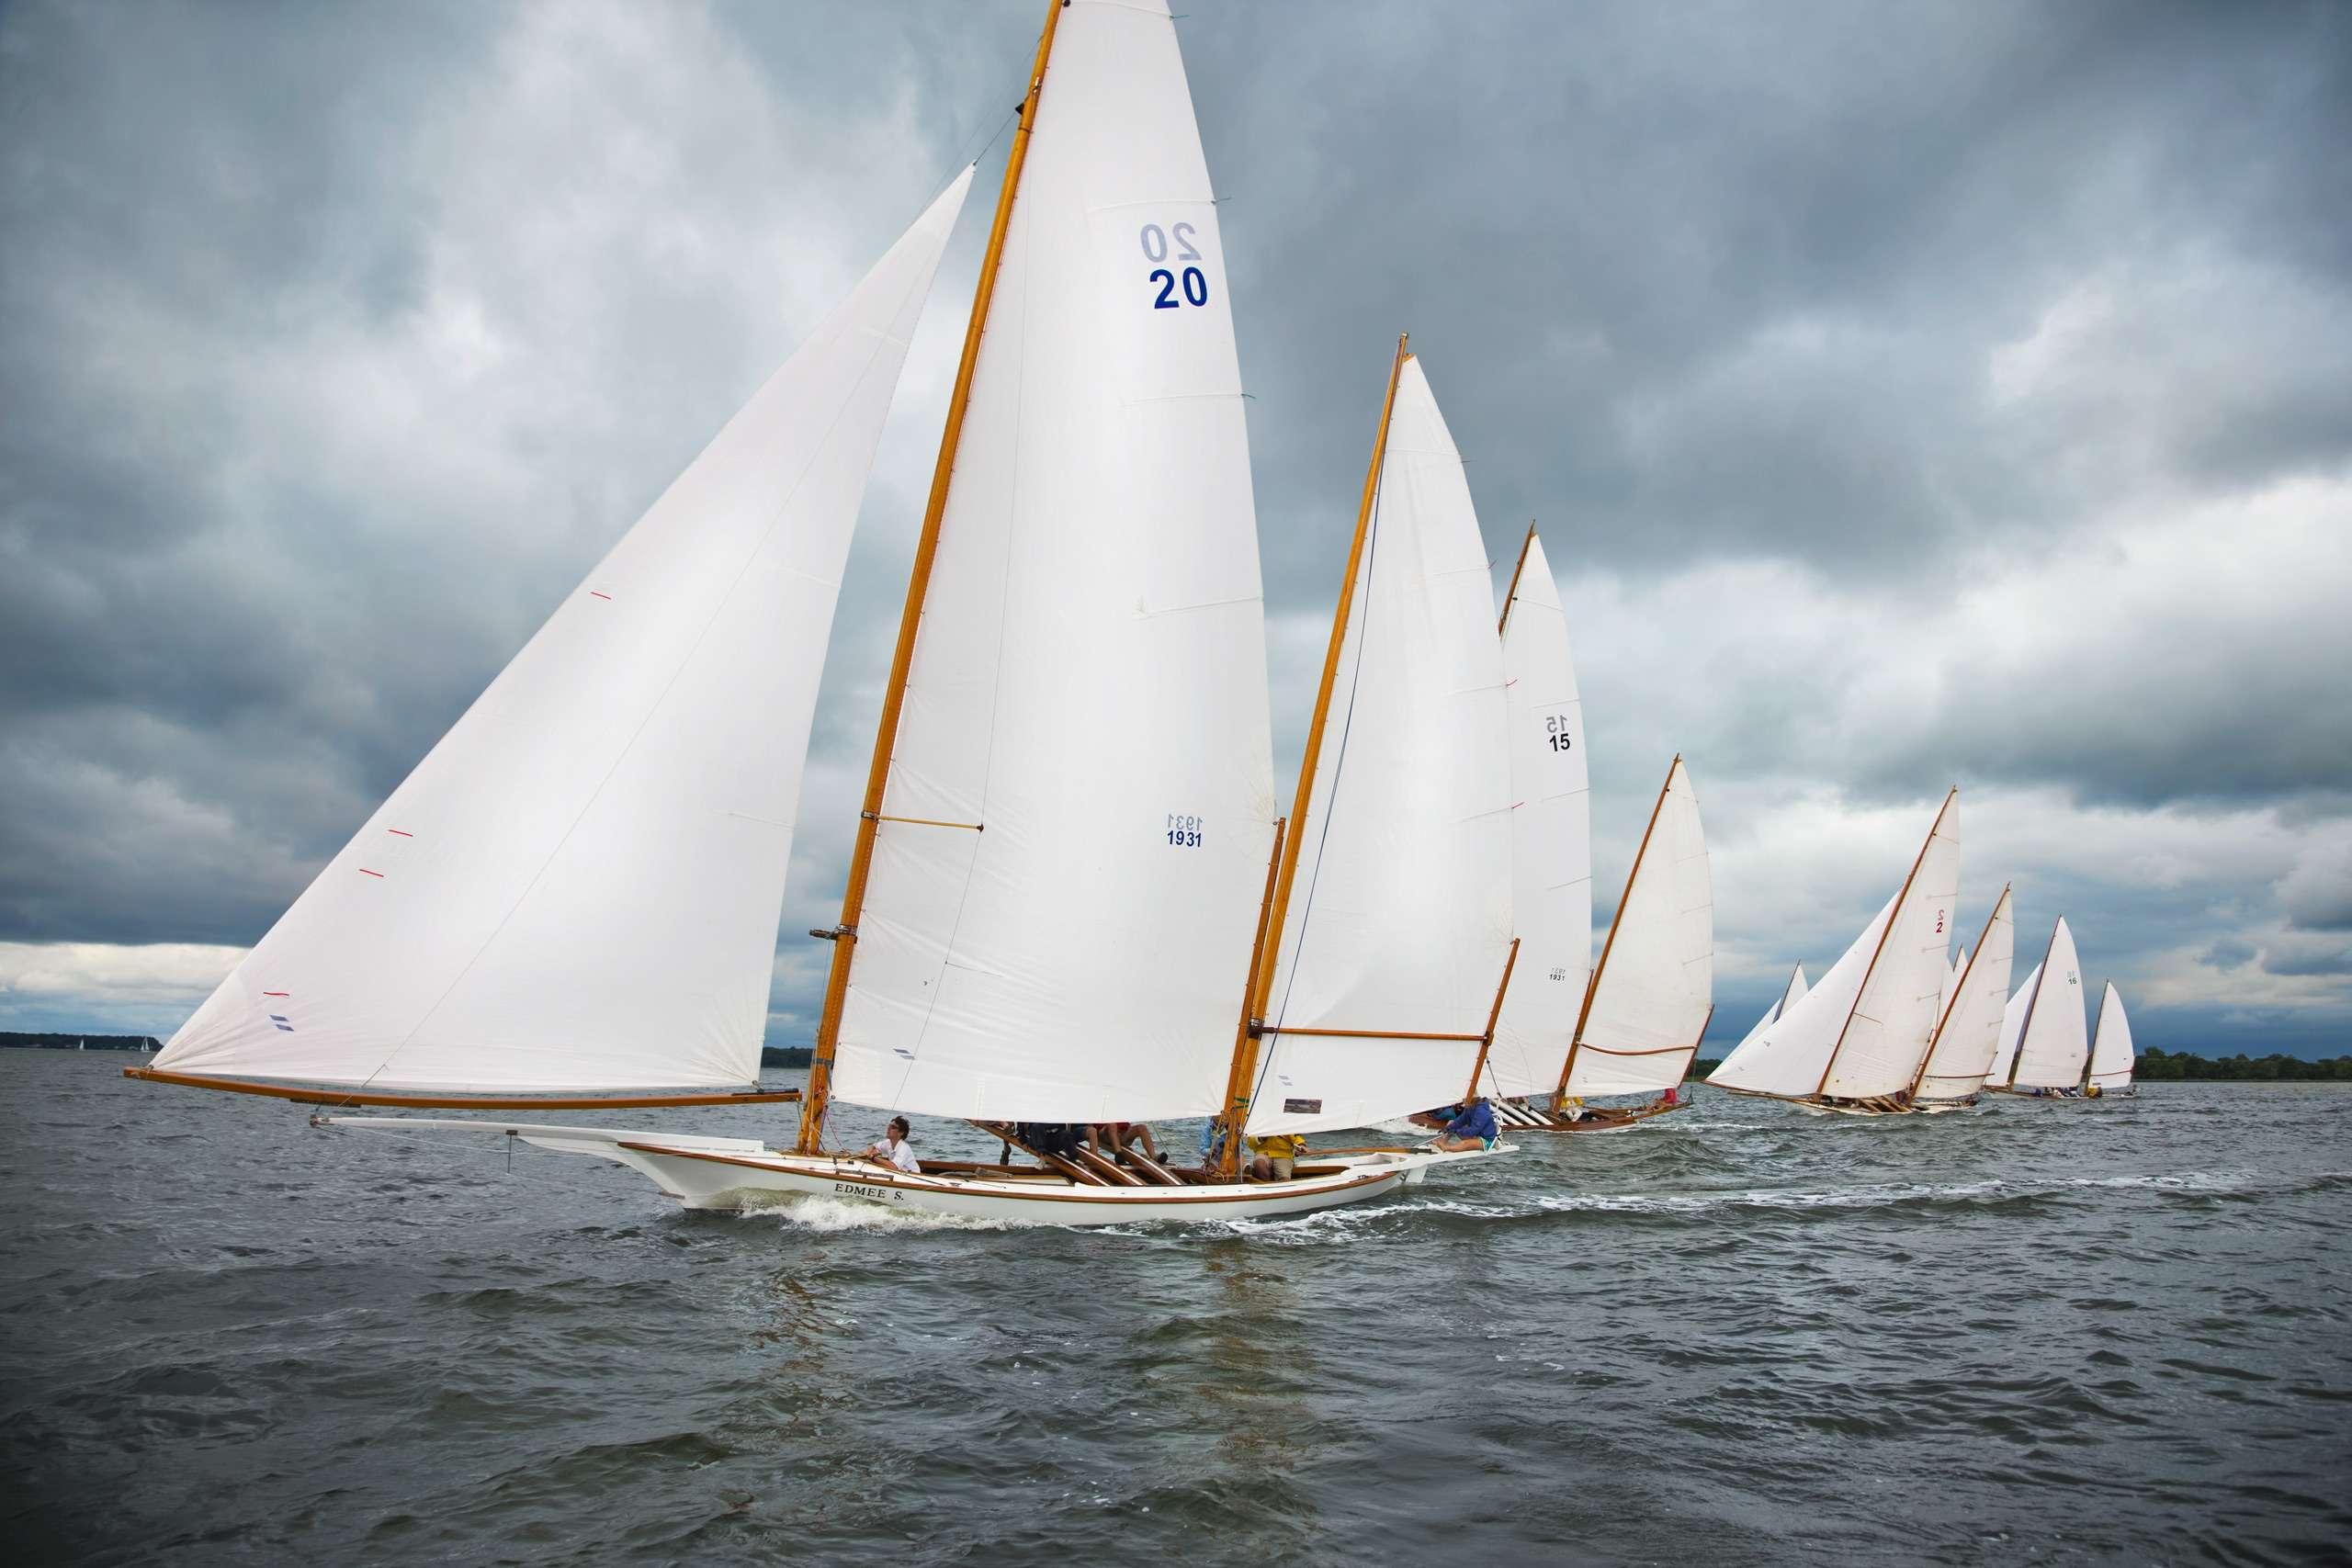 PORTFOLIO - Sailing - Log Canoes #18   PCG522